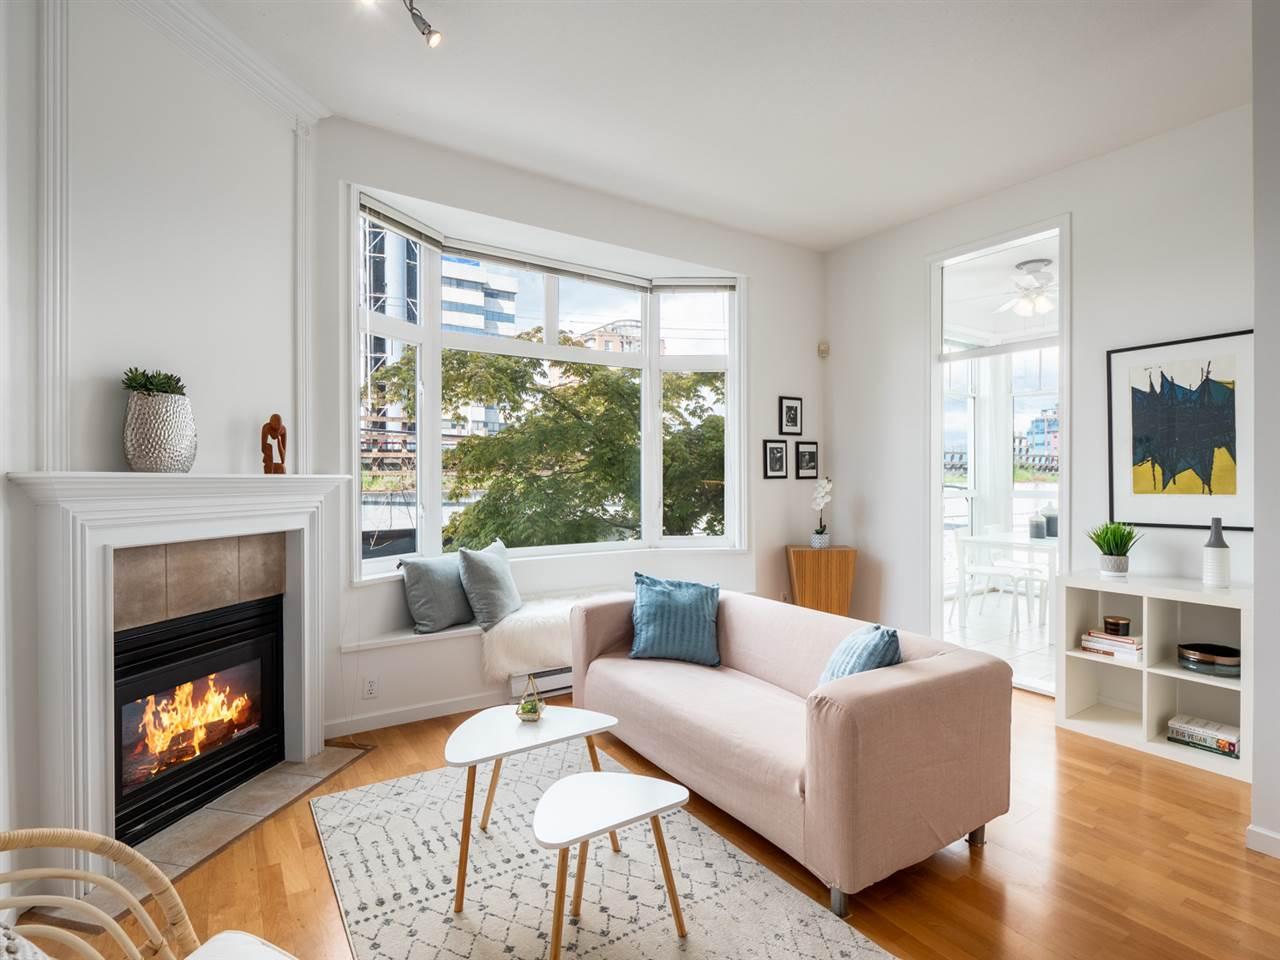 Removed: 205 - 2588 Alder Street, Vancouver, BC - Removed on 2019-06-07 05:45:15